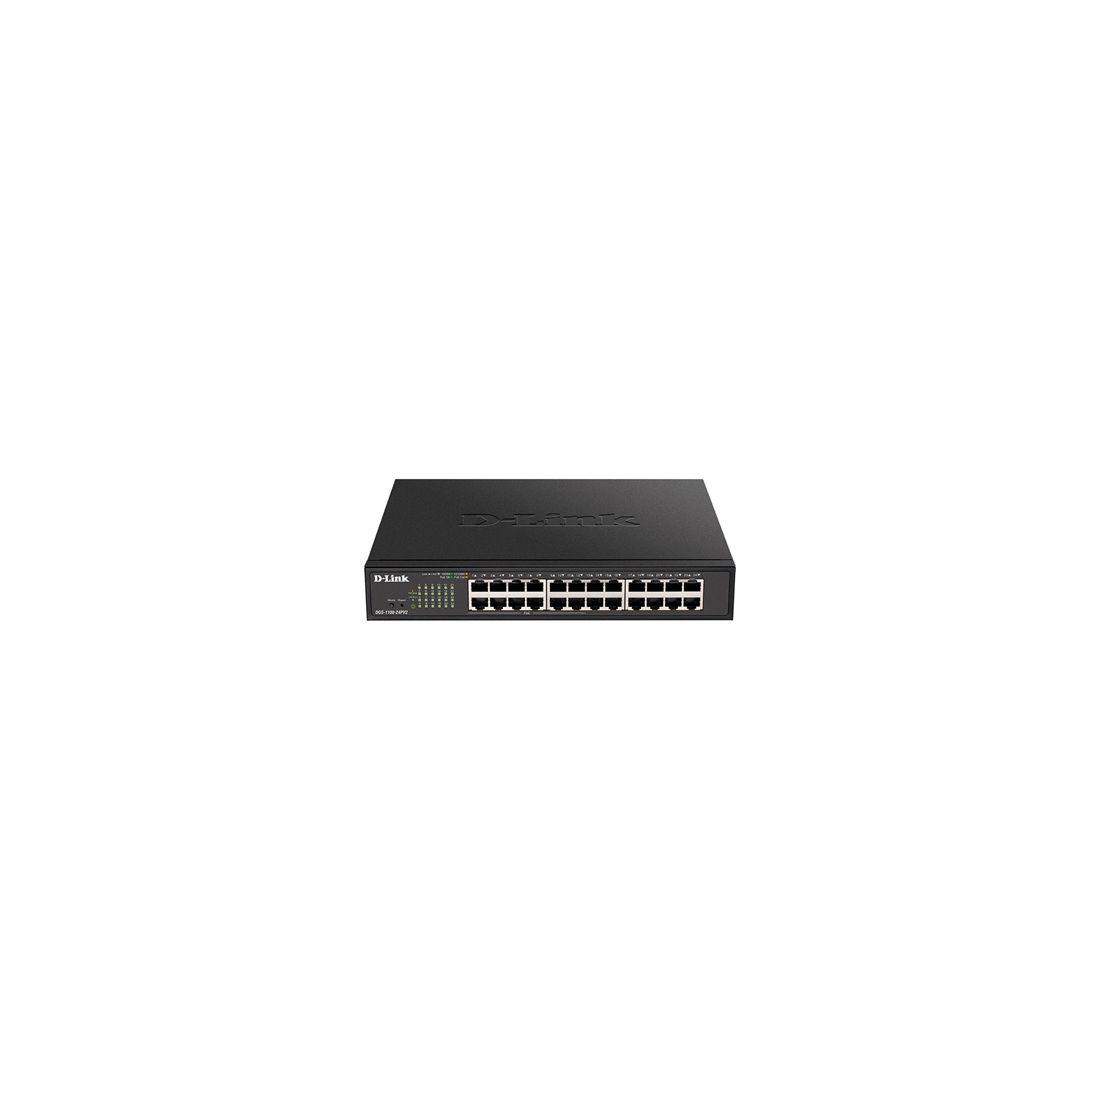 D Link DGS 1100 24PV2 Switch 24xGB PoE